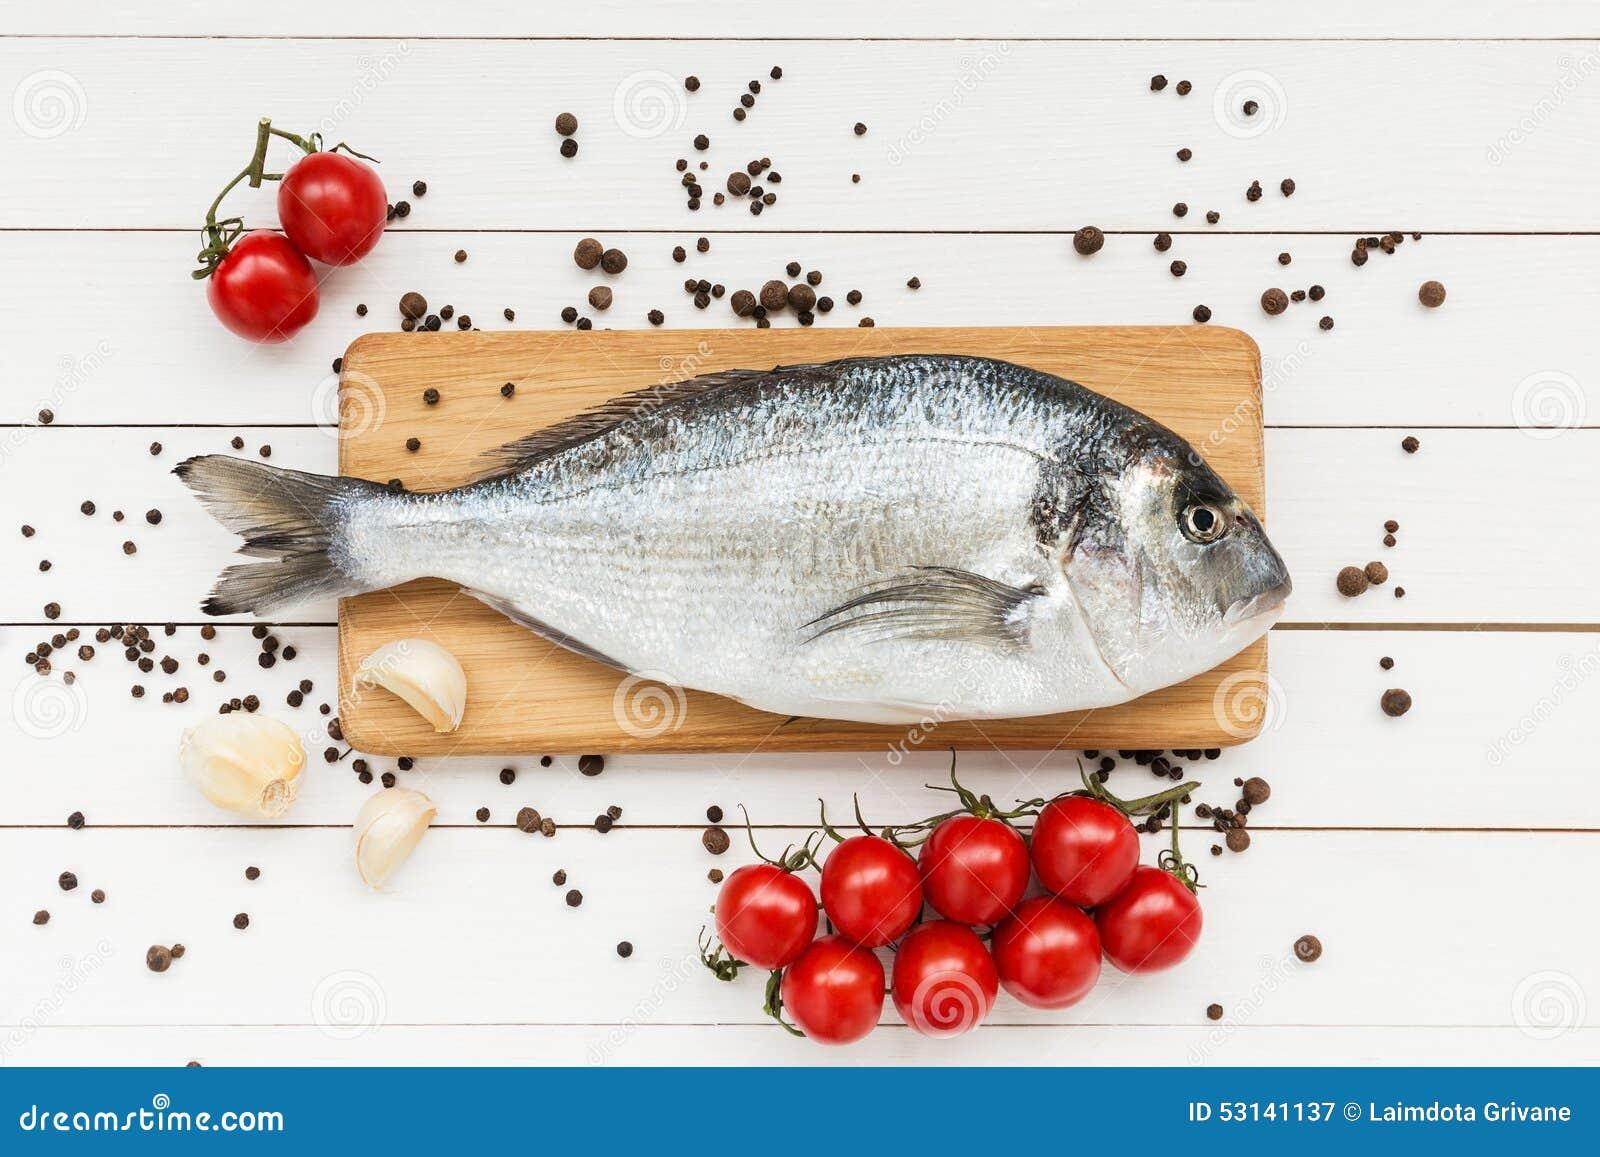 Fresh dorado fish on wooden cutting board with cherry for Fish cutting board